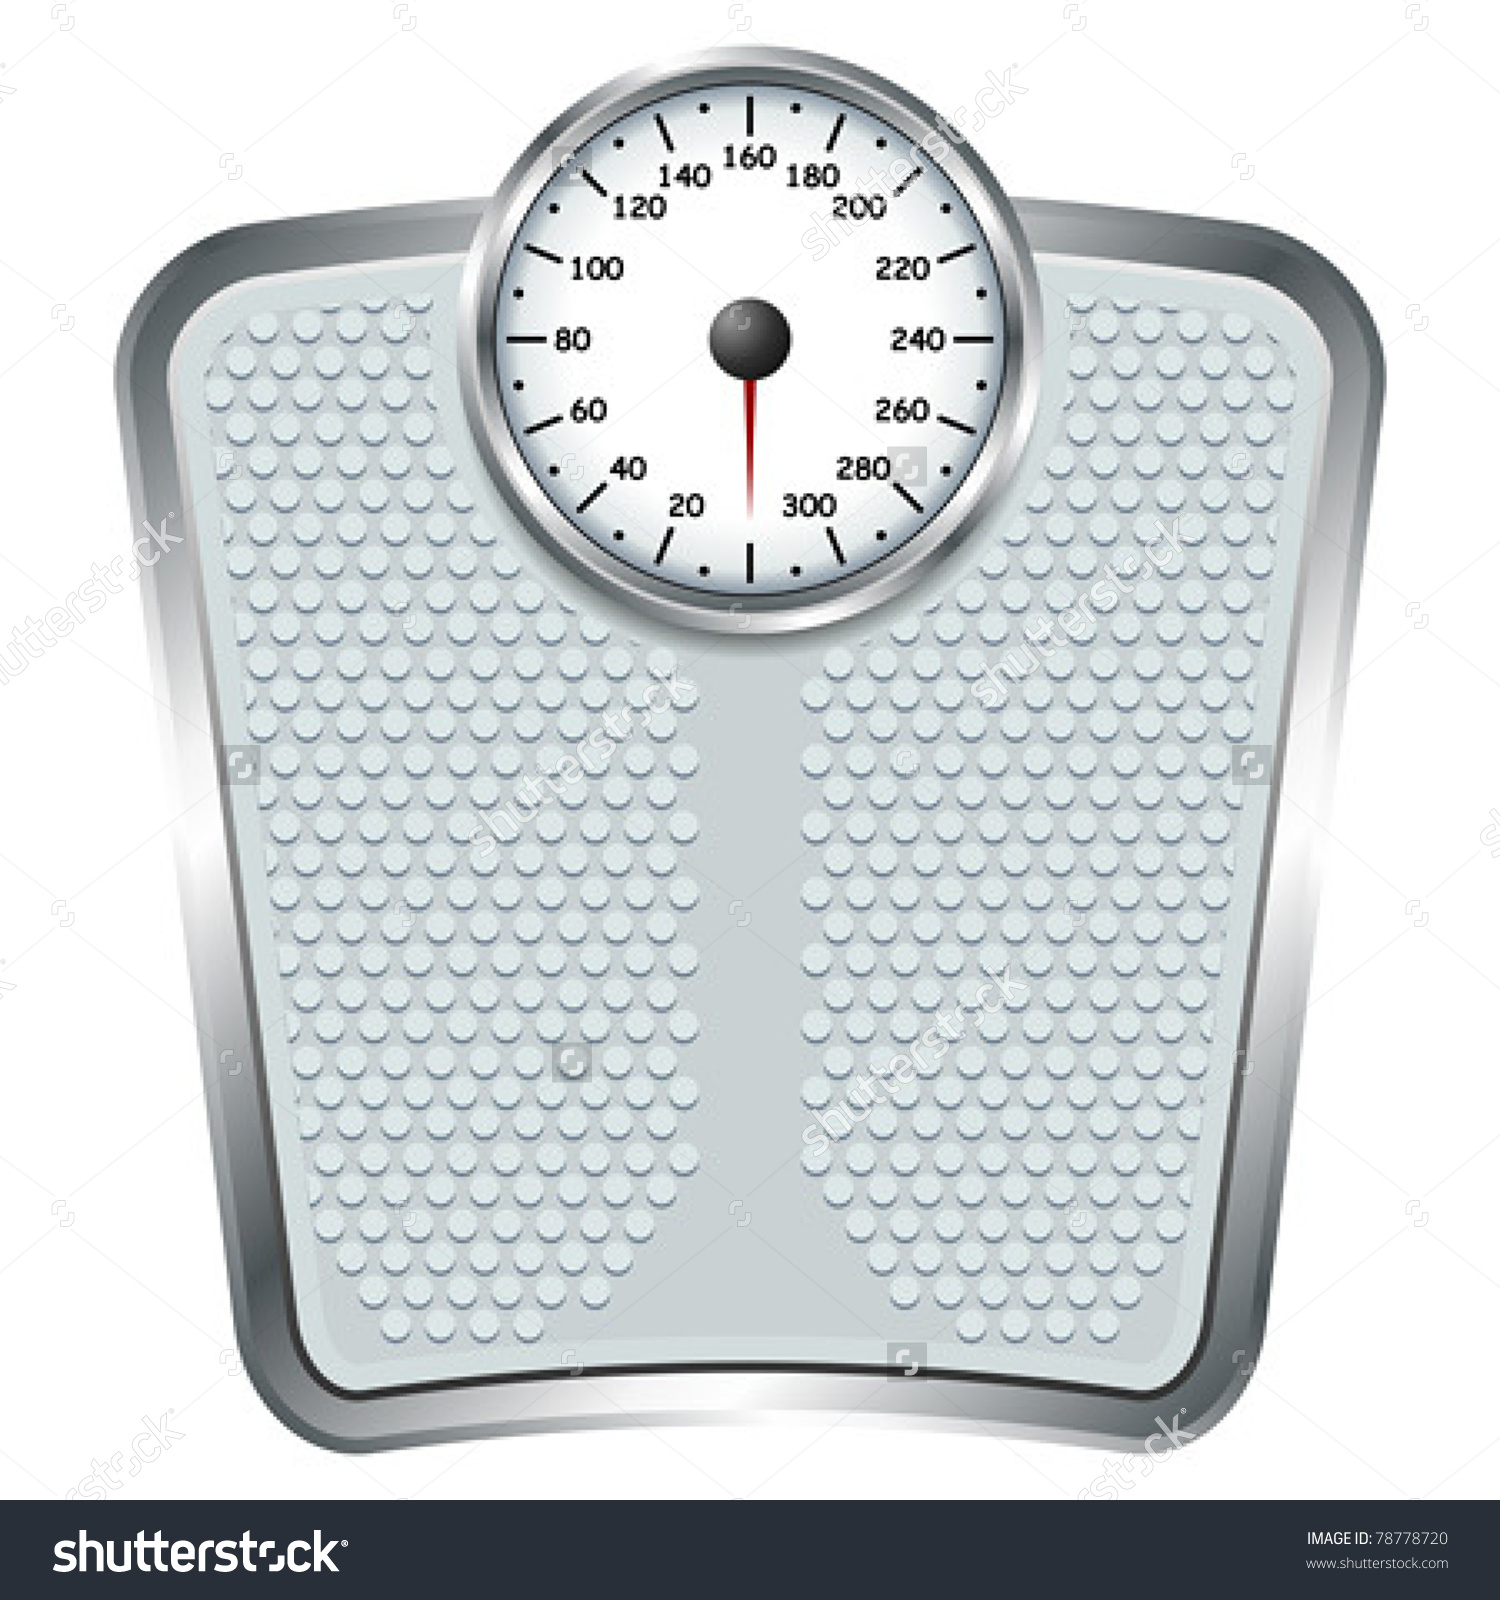 Bathroom scale clipart - Clipground